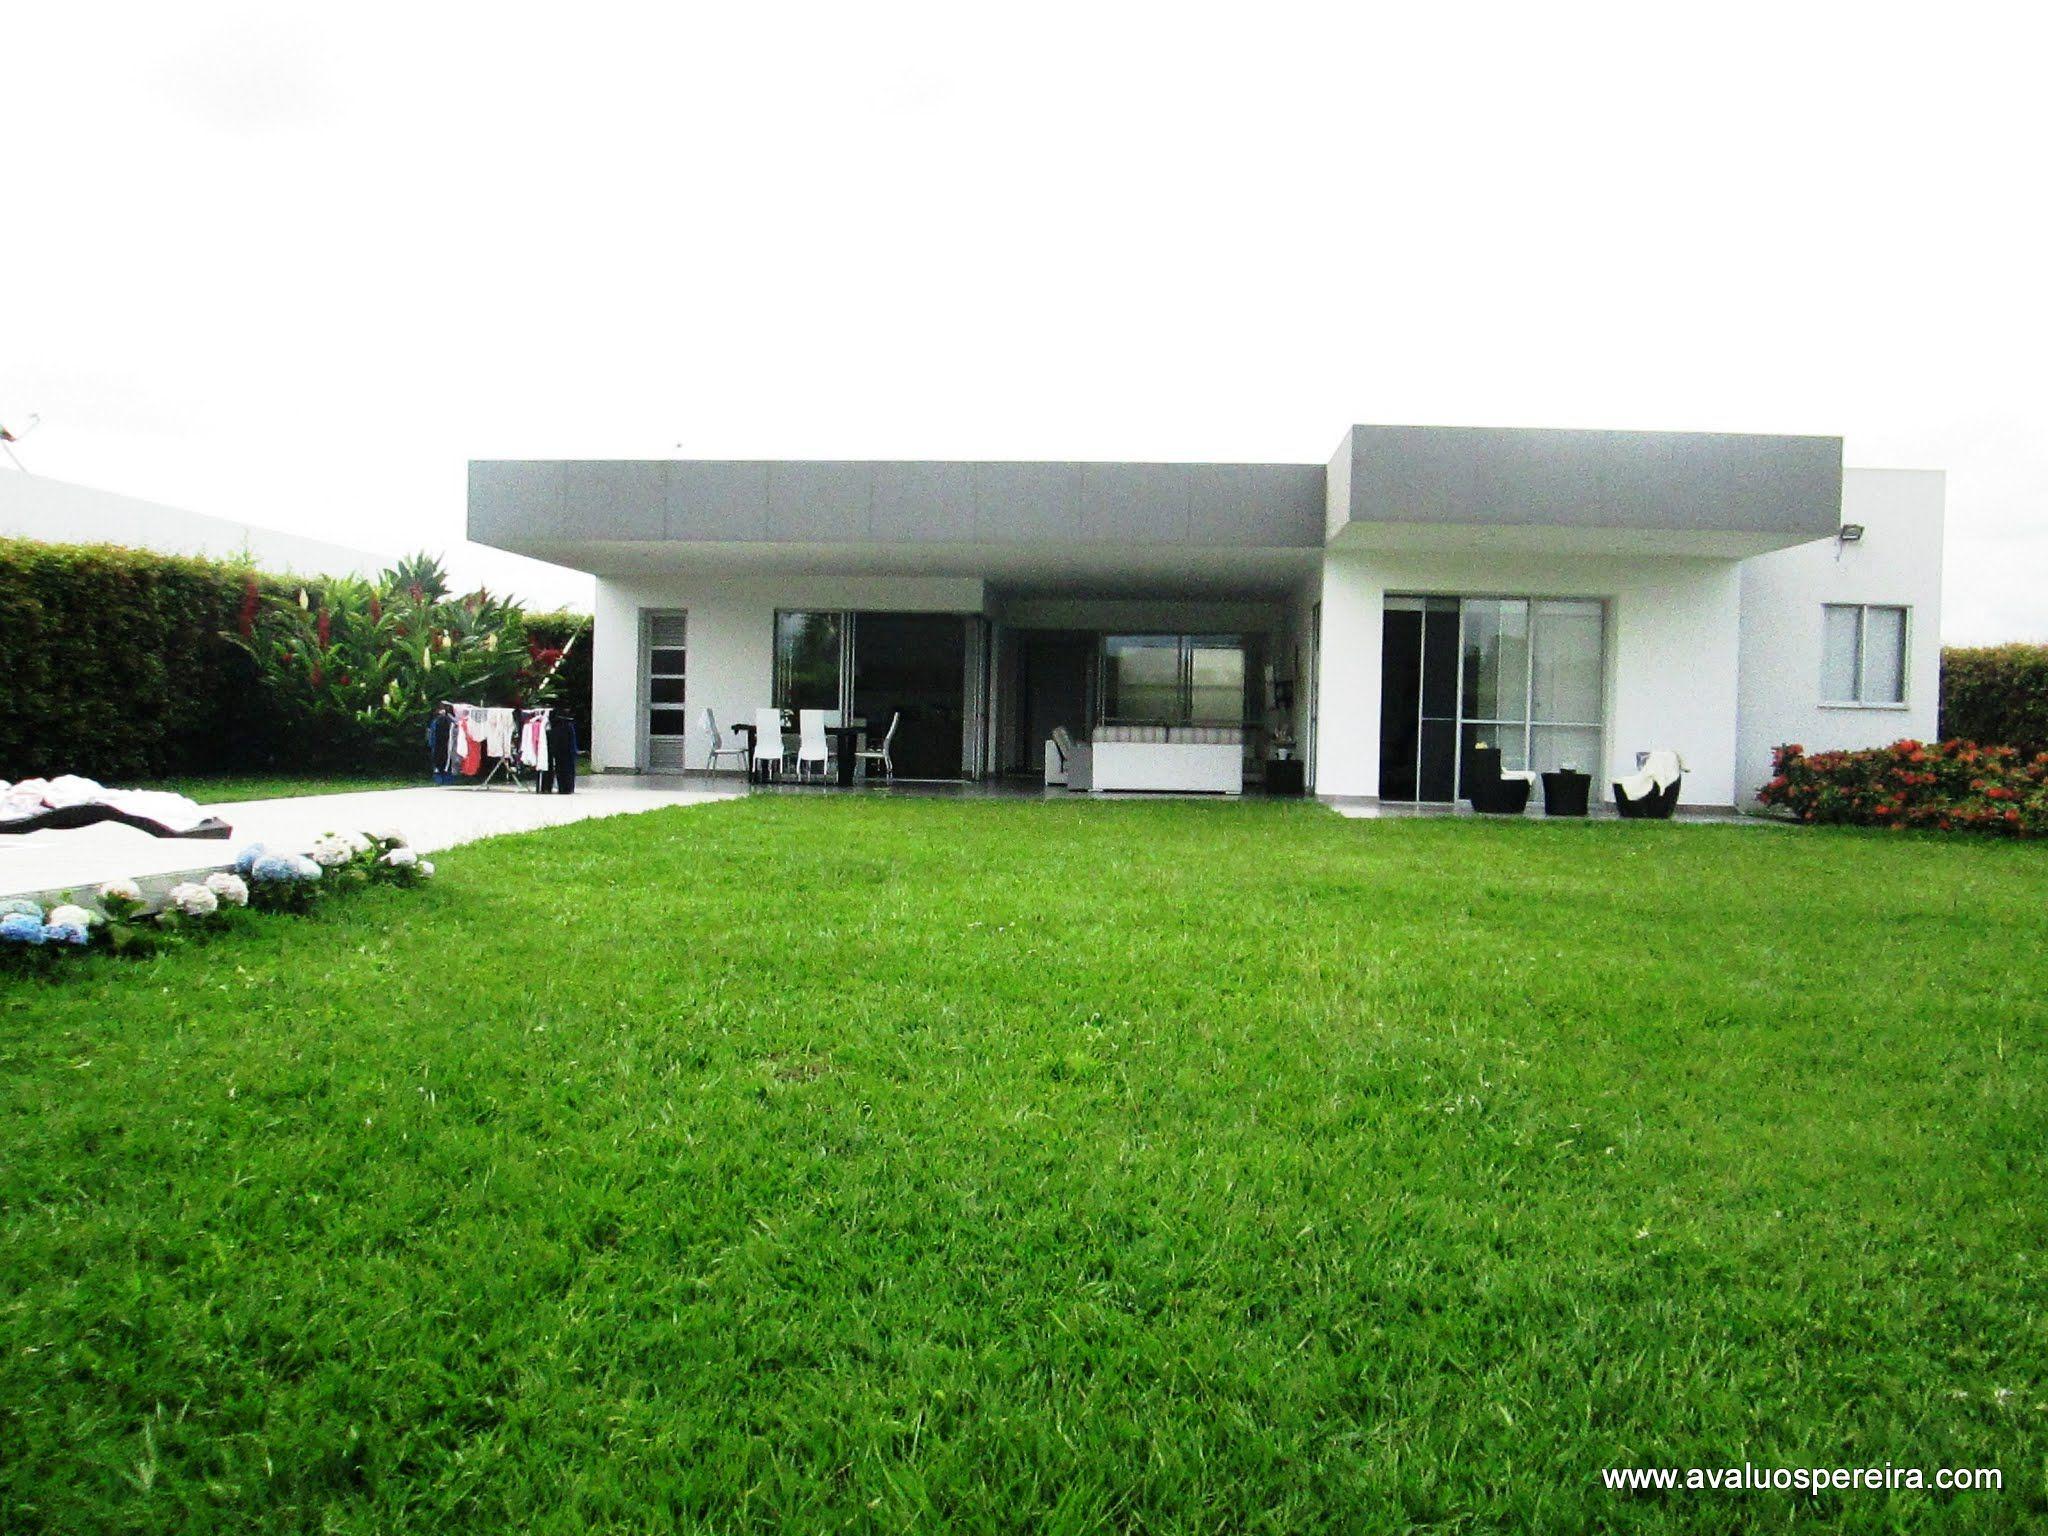 San Jose de Las Villas, www.avaluospereira.com